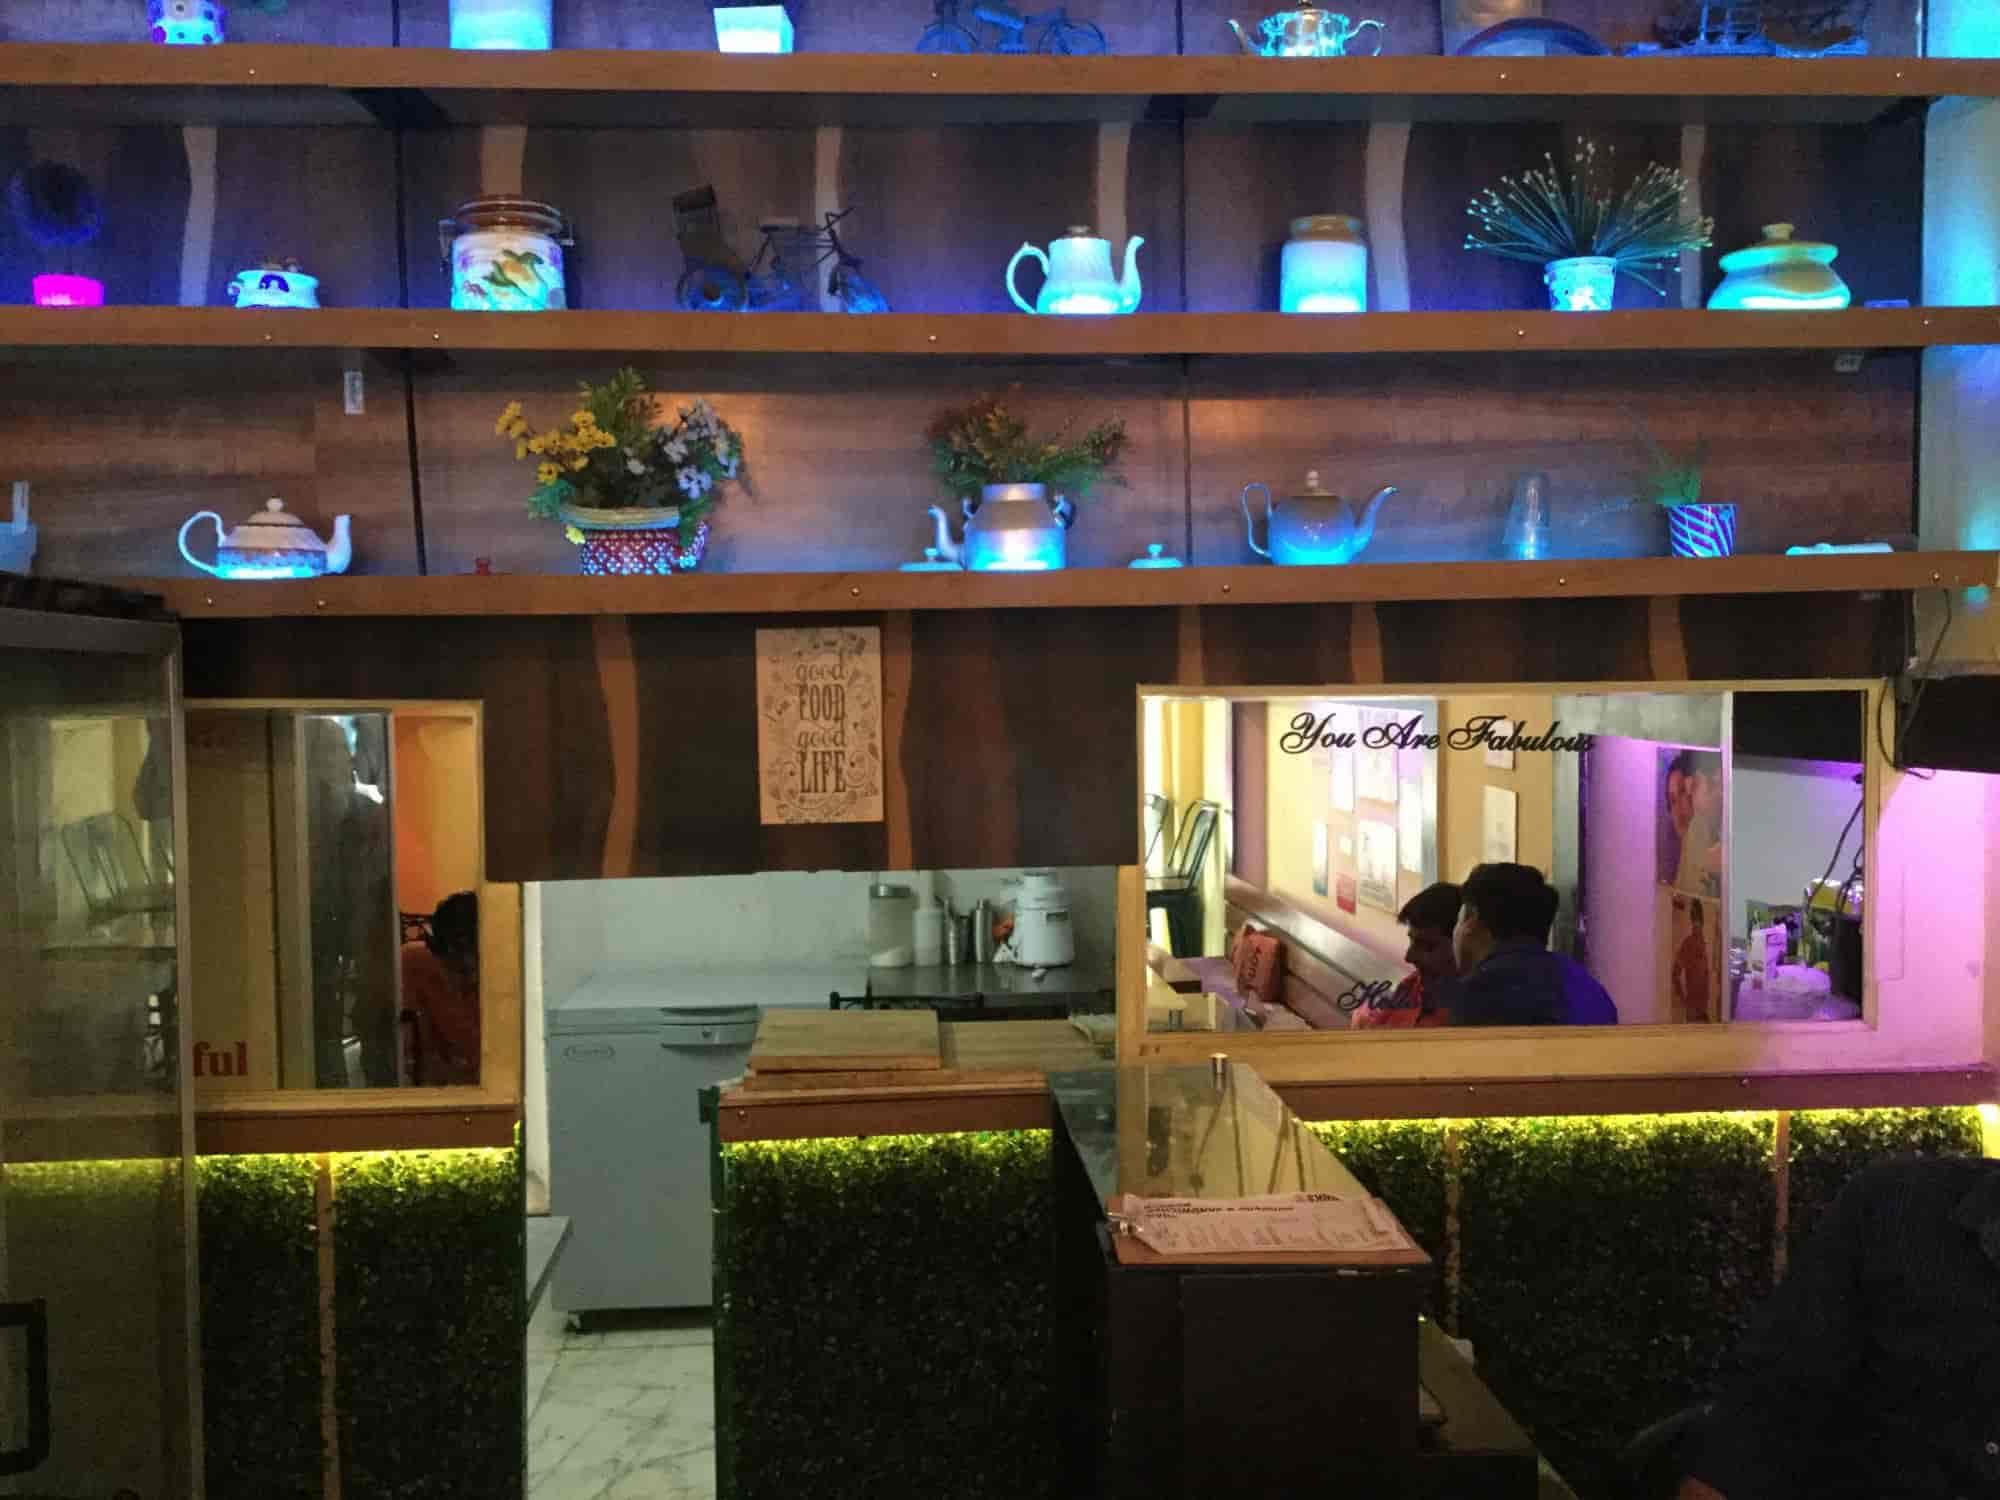 grannys kitchen photos satya niketan delhi north indian restaurants - Grannys Kitchen